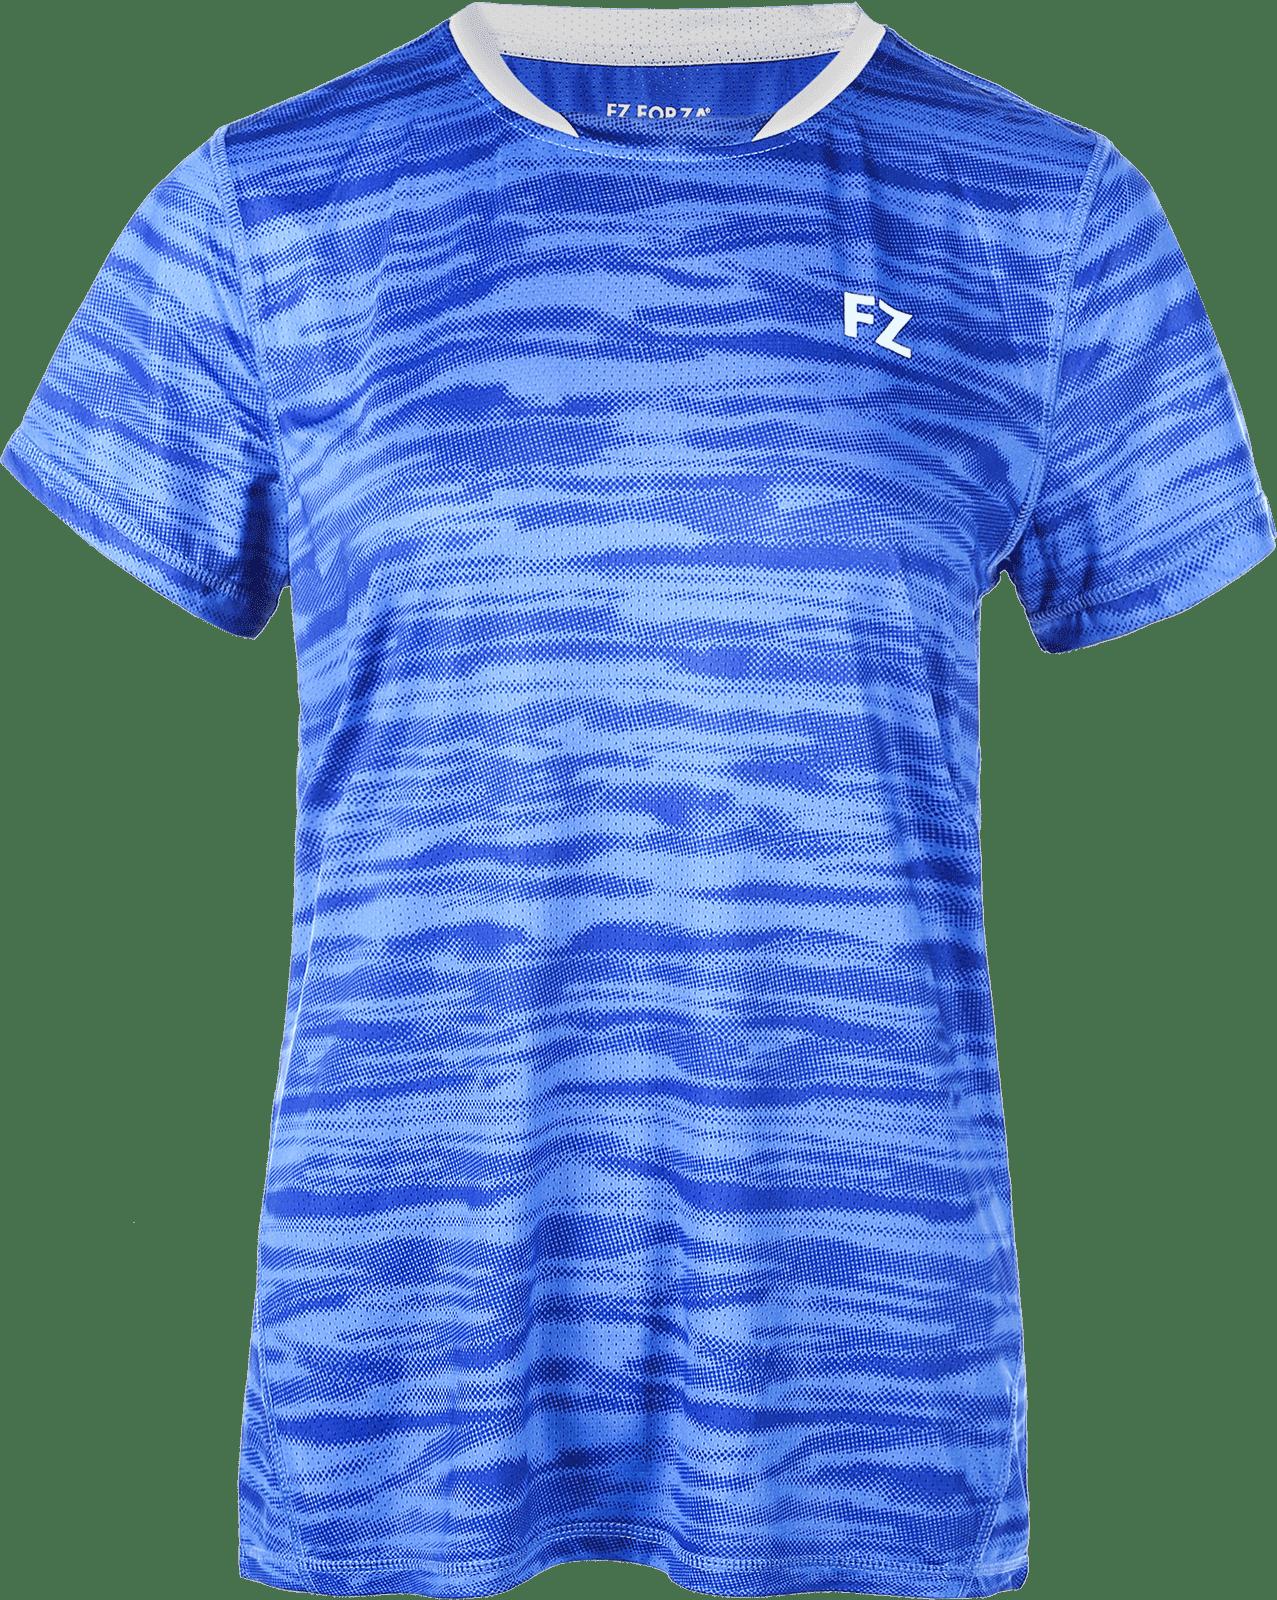 Forza Malay W S/S Tee, 2081 Blue Aster